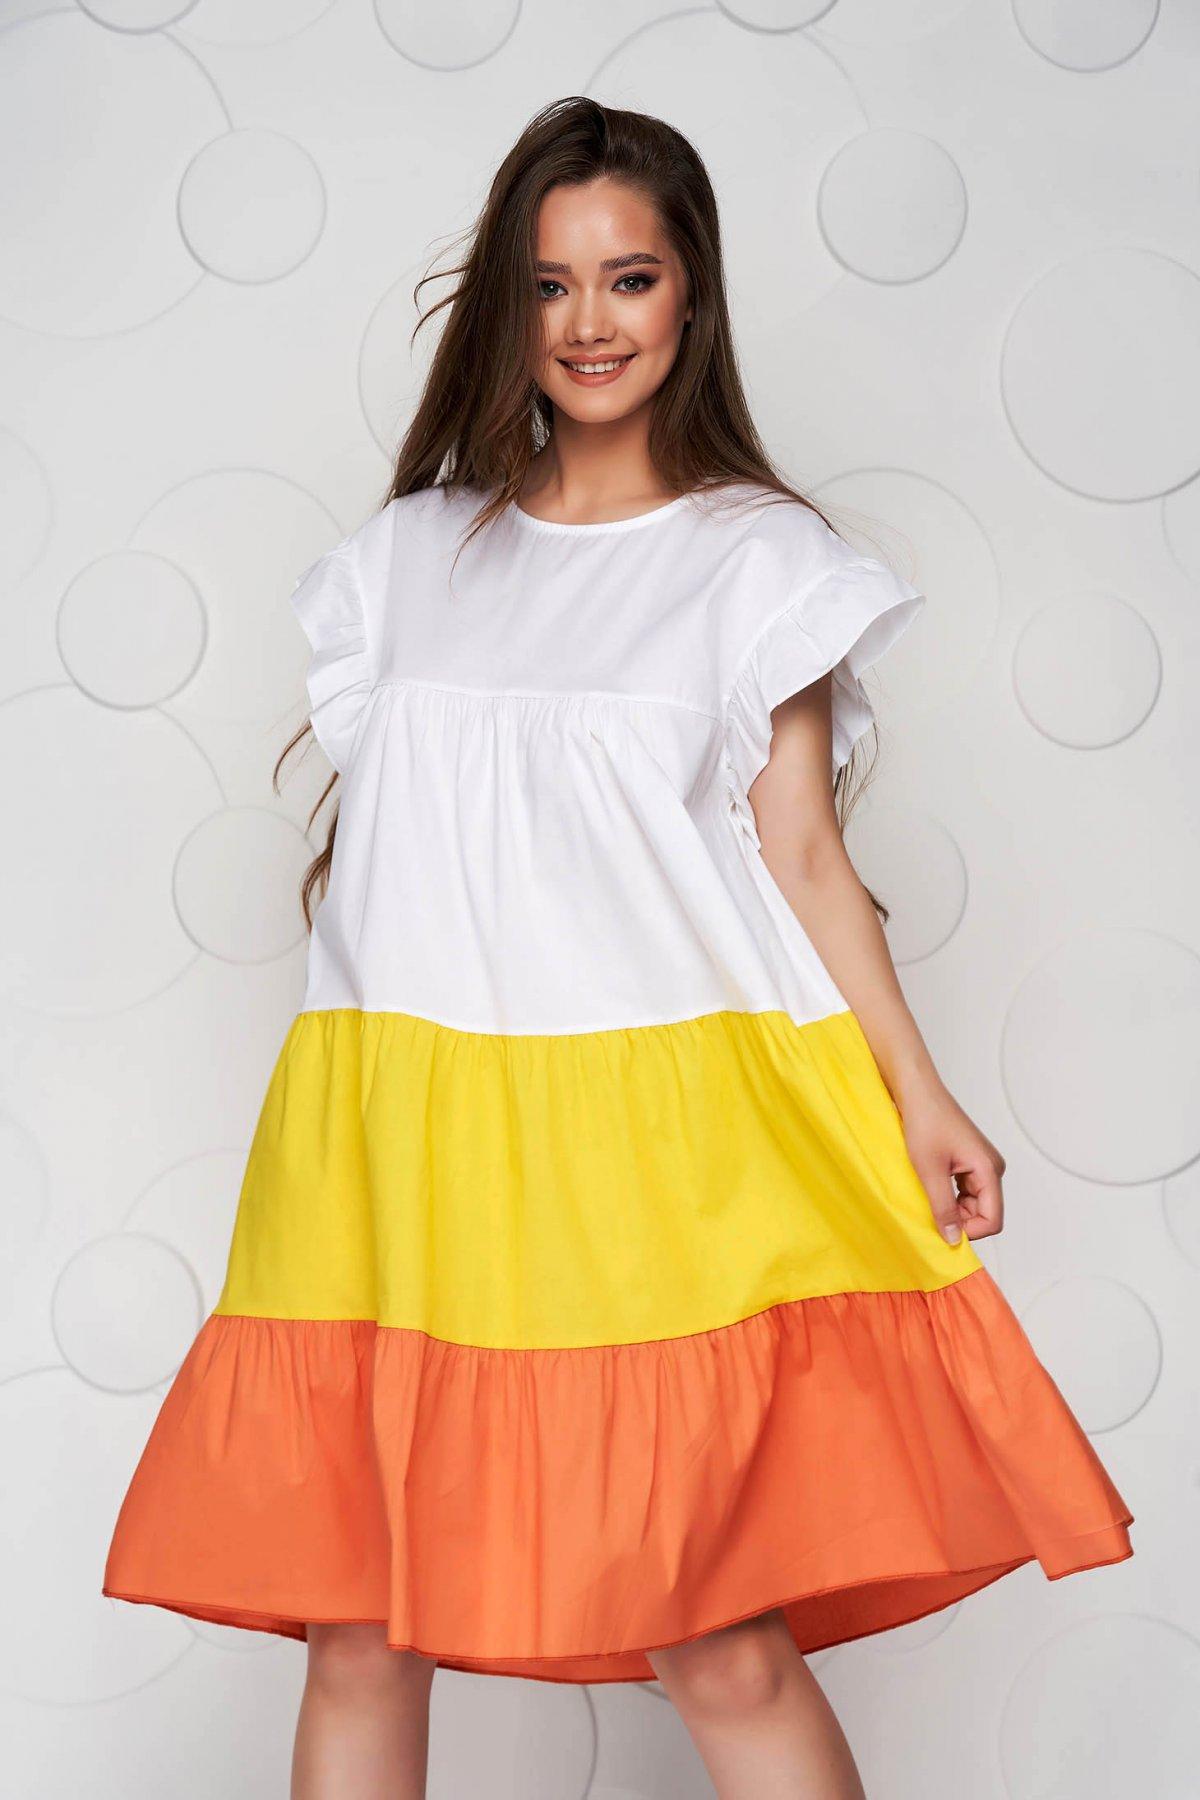 Rochie alba cu galben din material vaporos si subtire cu croi larg midi cu volanase - medelin.ro